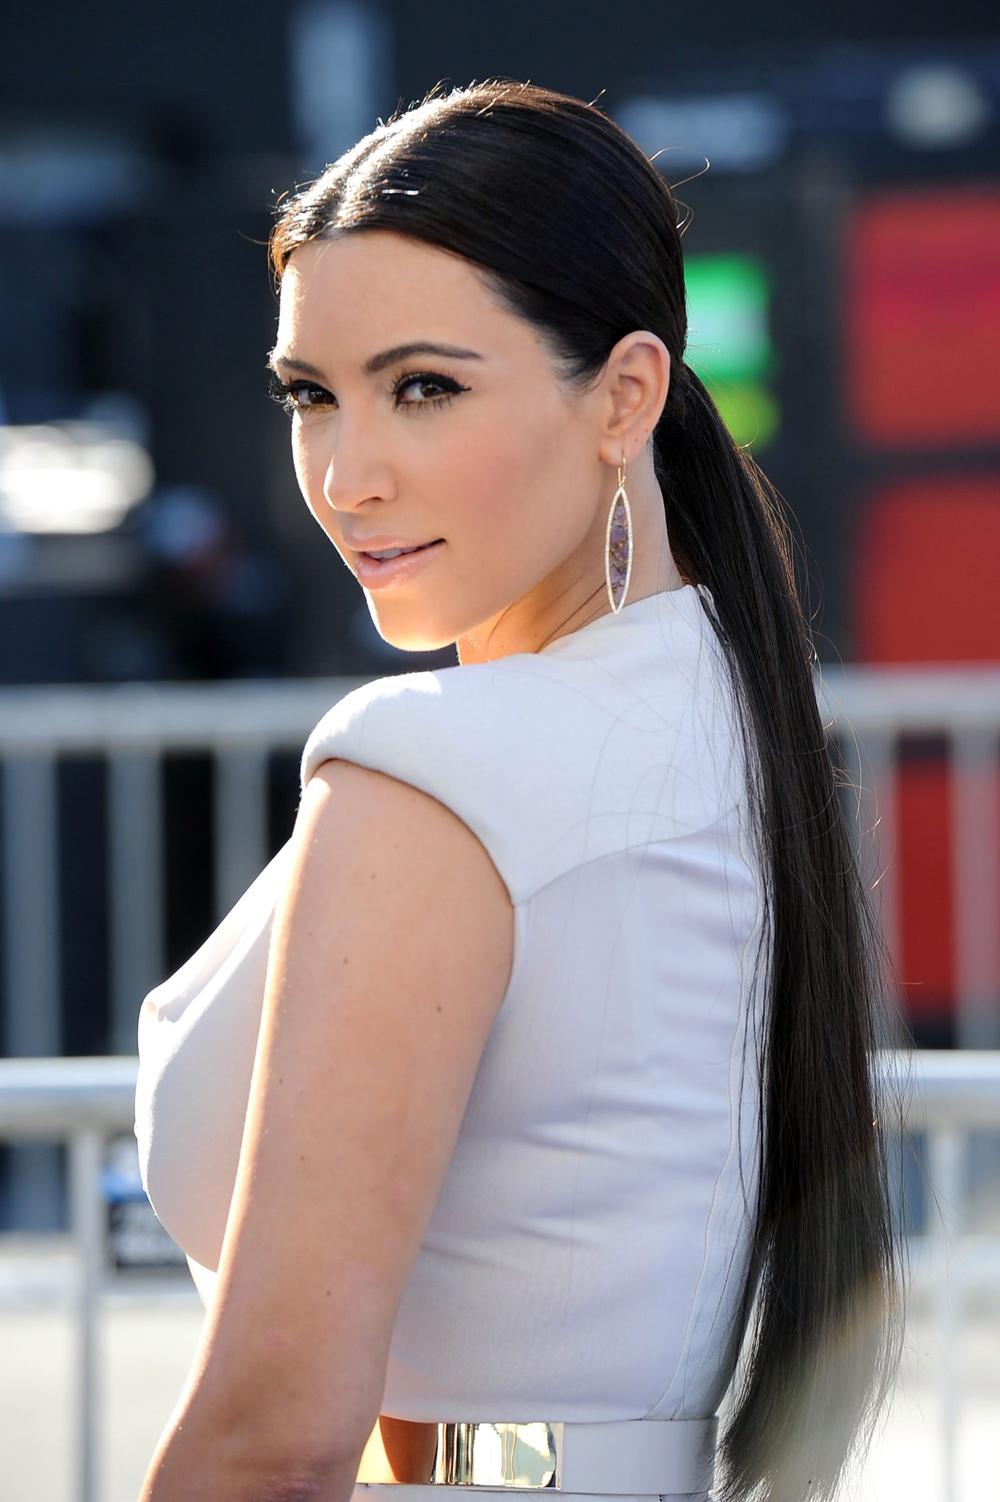 Kim Kardashian Black Ponytail Hairstyles 02